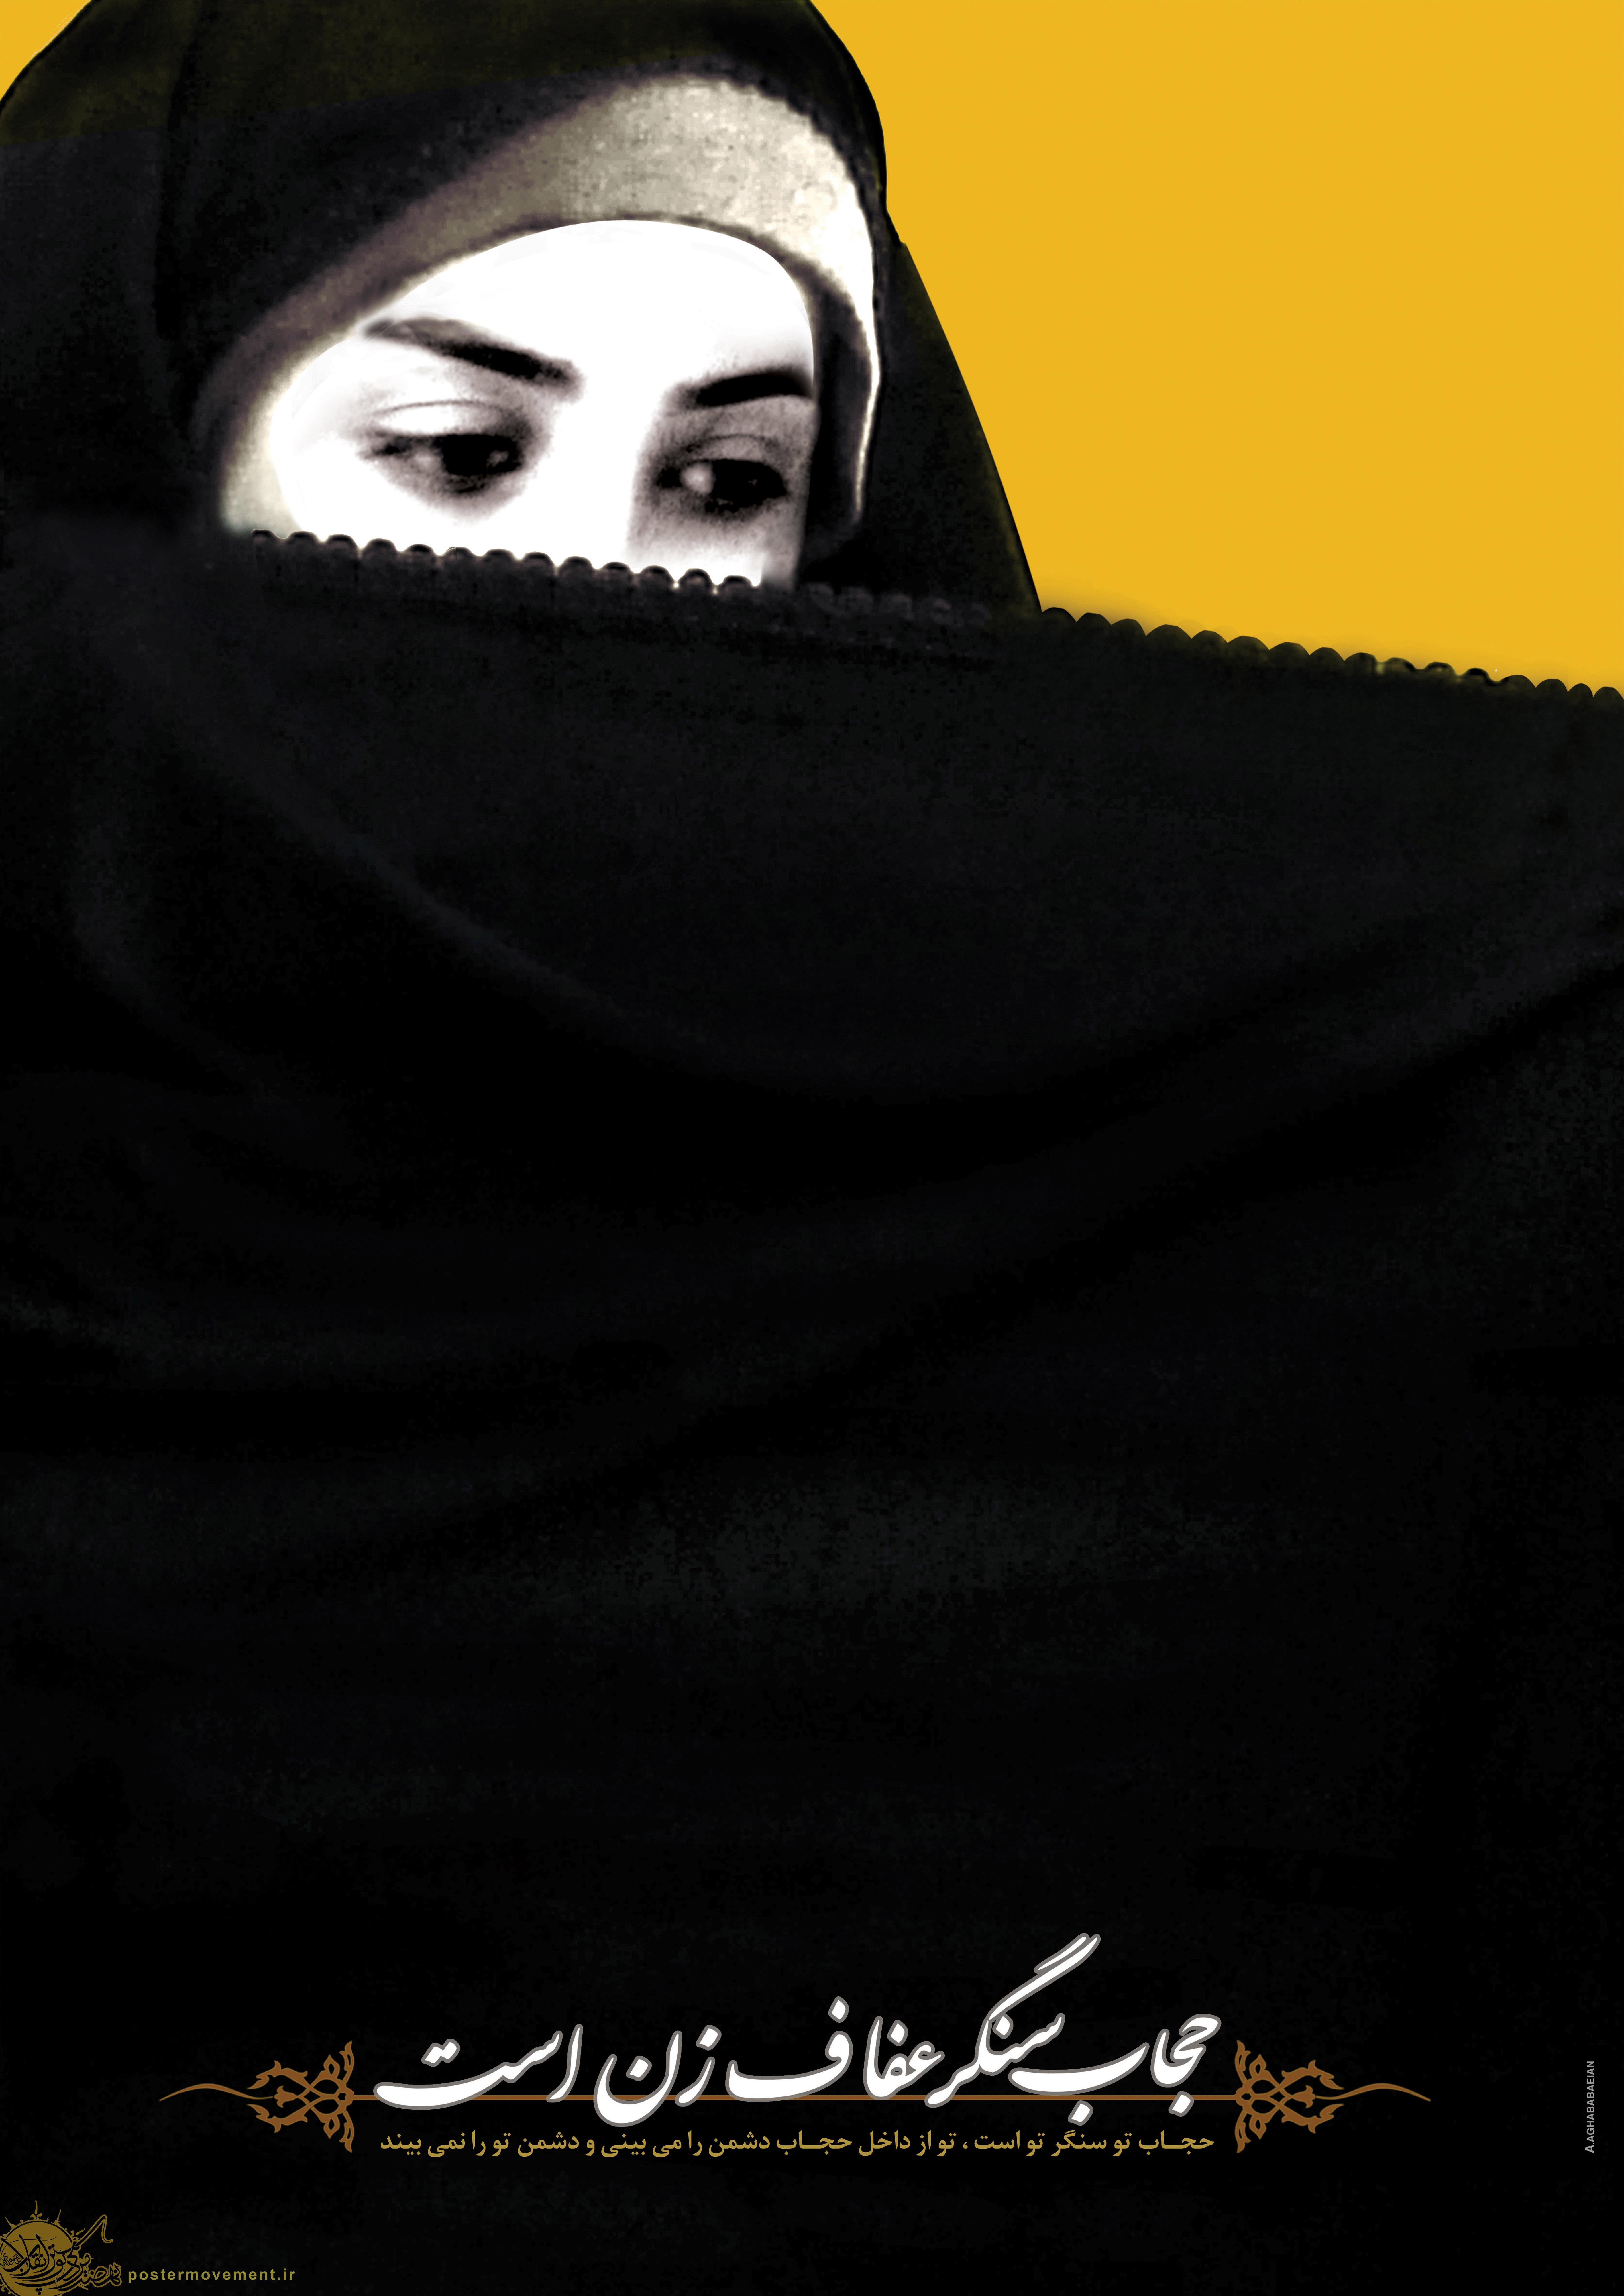 پوستر - سنگر حجاب